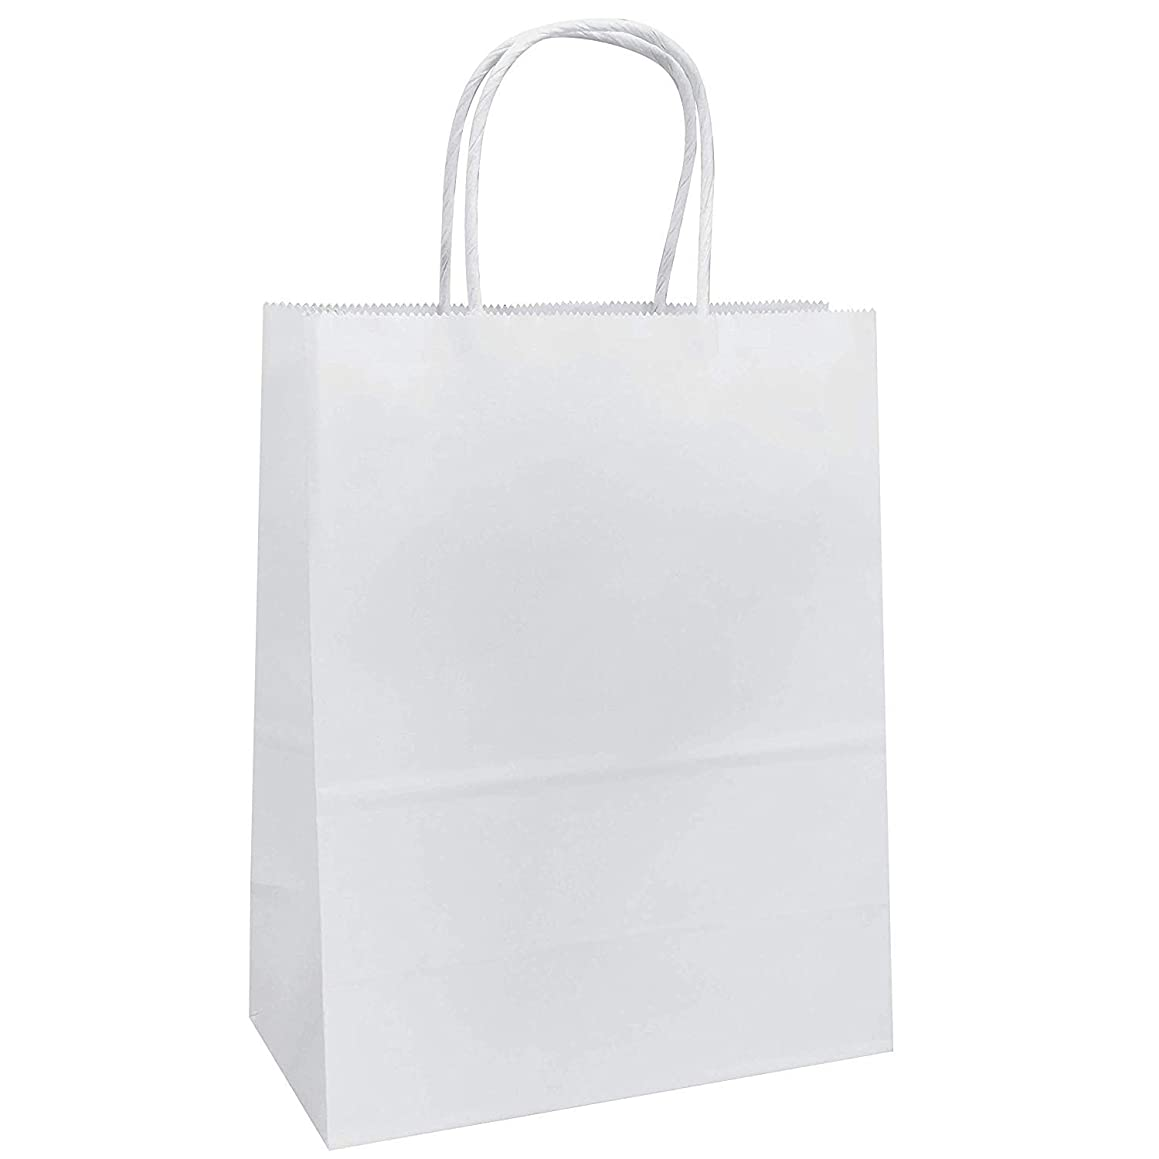 Quanyong Kraft Paper Bags 50Pcs 5.25